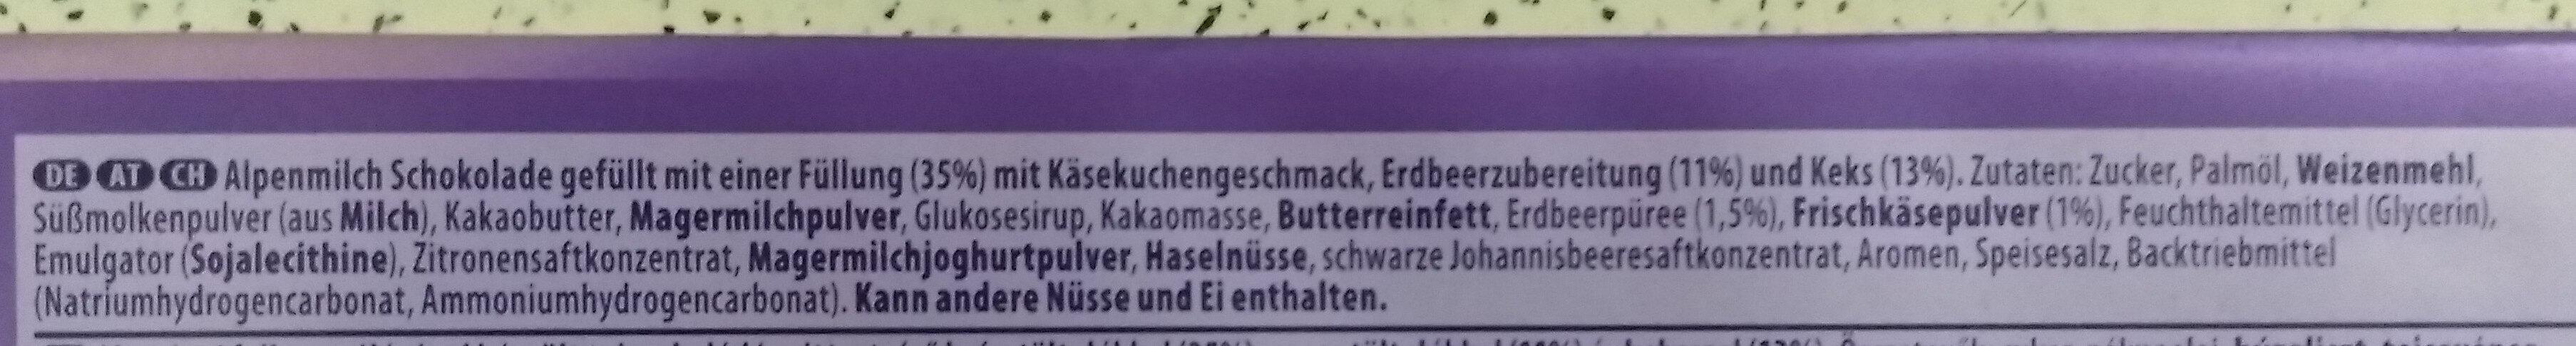 Mmmax Strawberry Cheesecake - Ingredients - de